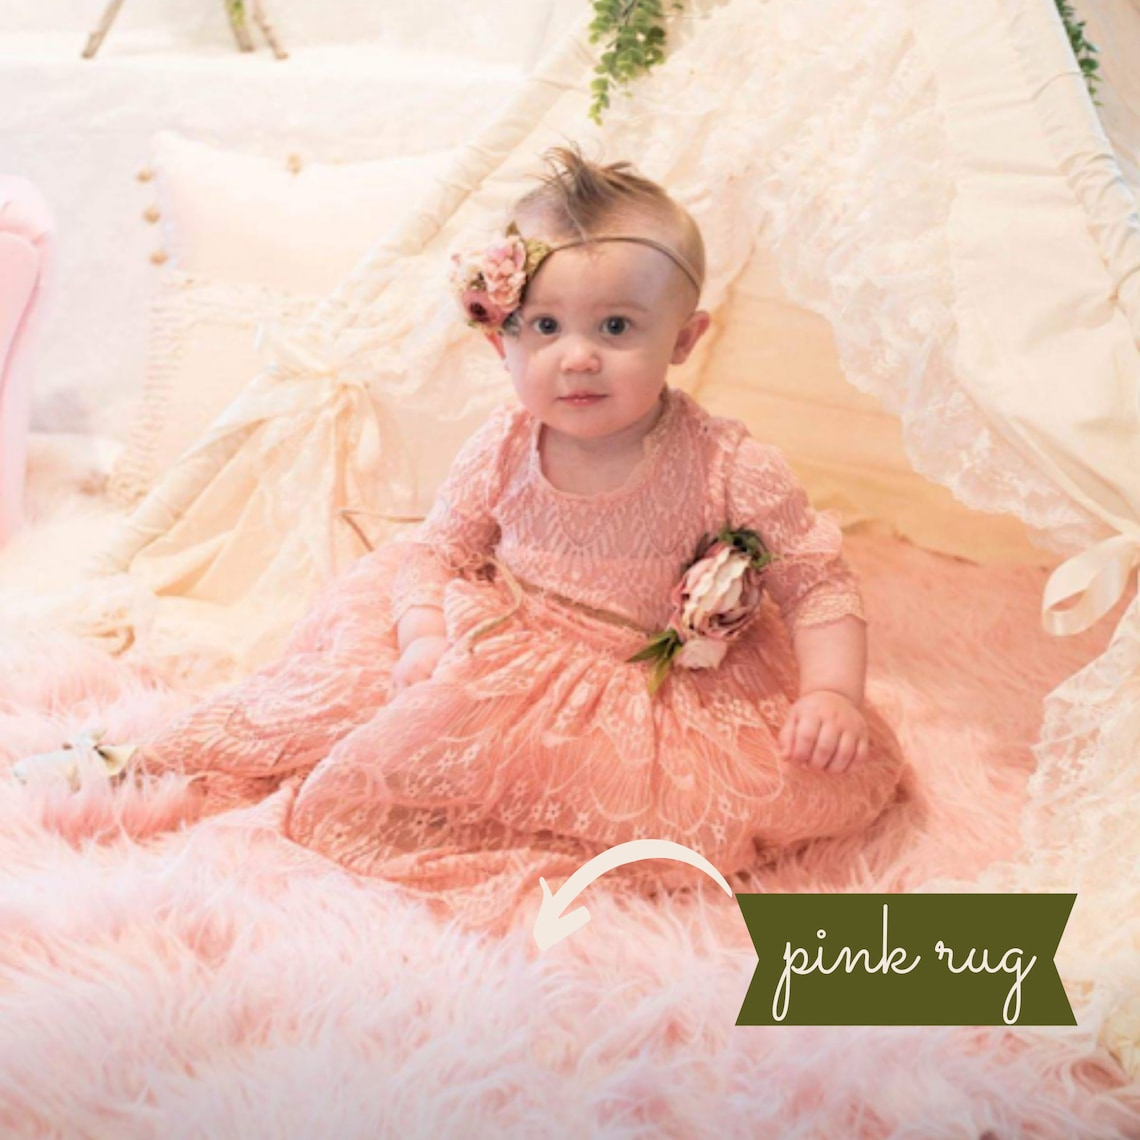 Shabby Chic Nursery Decor - Boho Lace Teepee